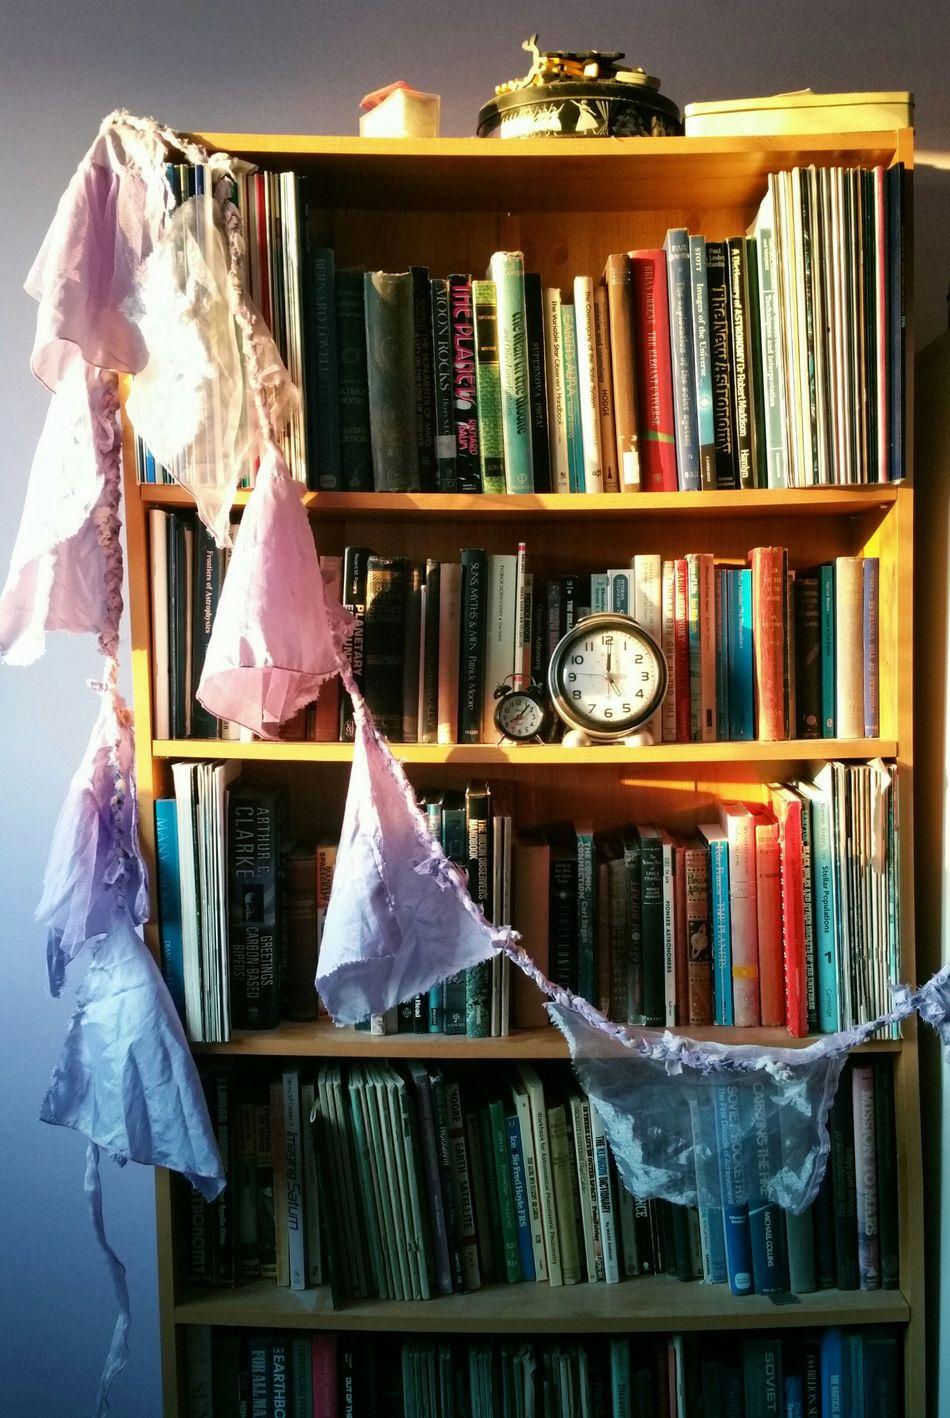 ... Home Time ... Bookshelf Bookcase Books Evening Light Clocks Bohemian Interior Decorations Light книги будильник полка Lieblingsteil